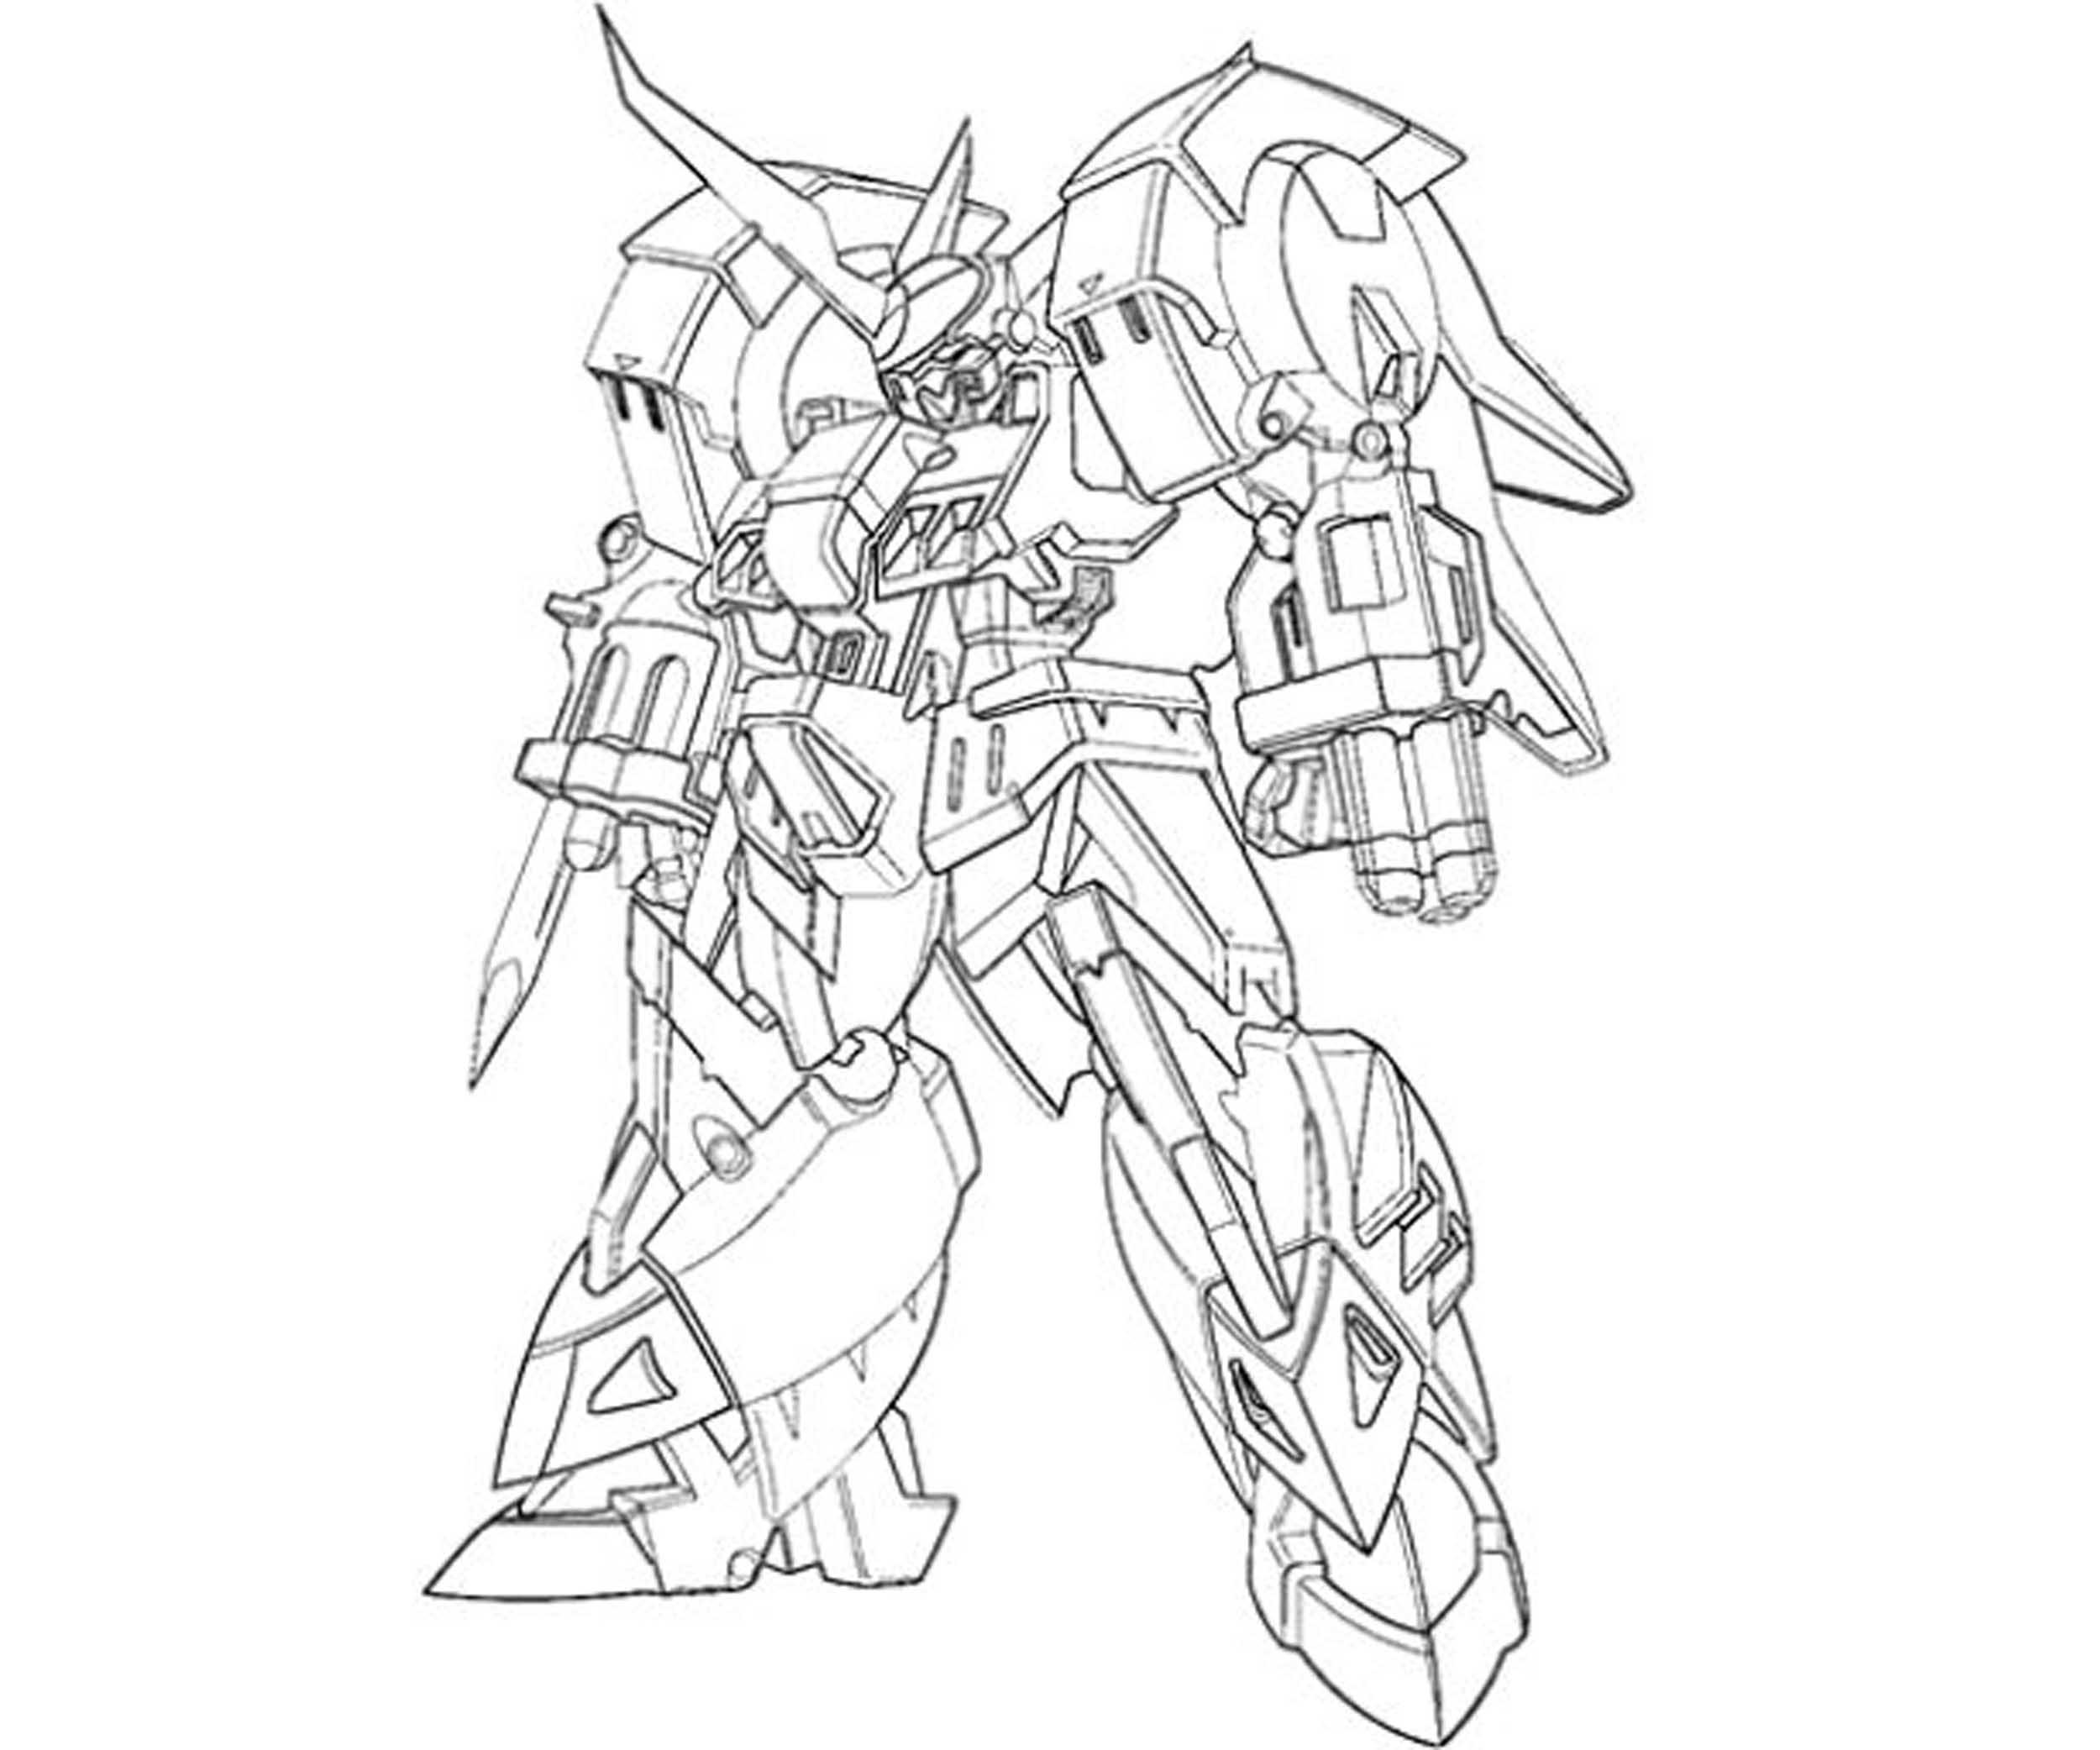 Transformers Drawing At Getdrawings